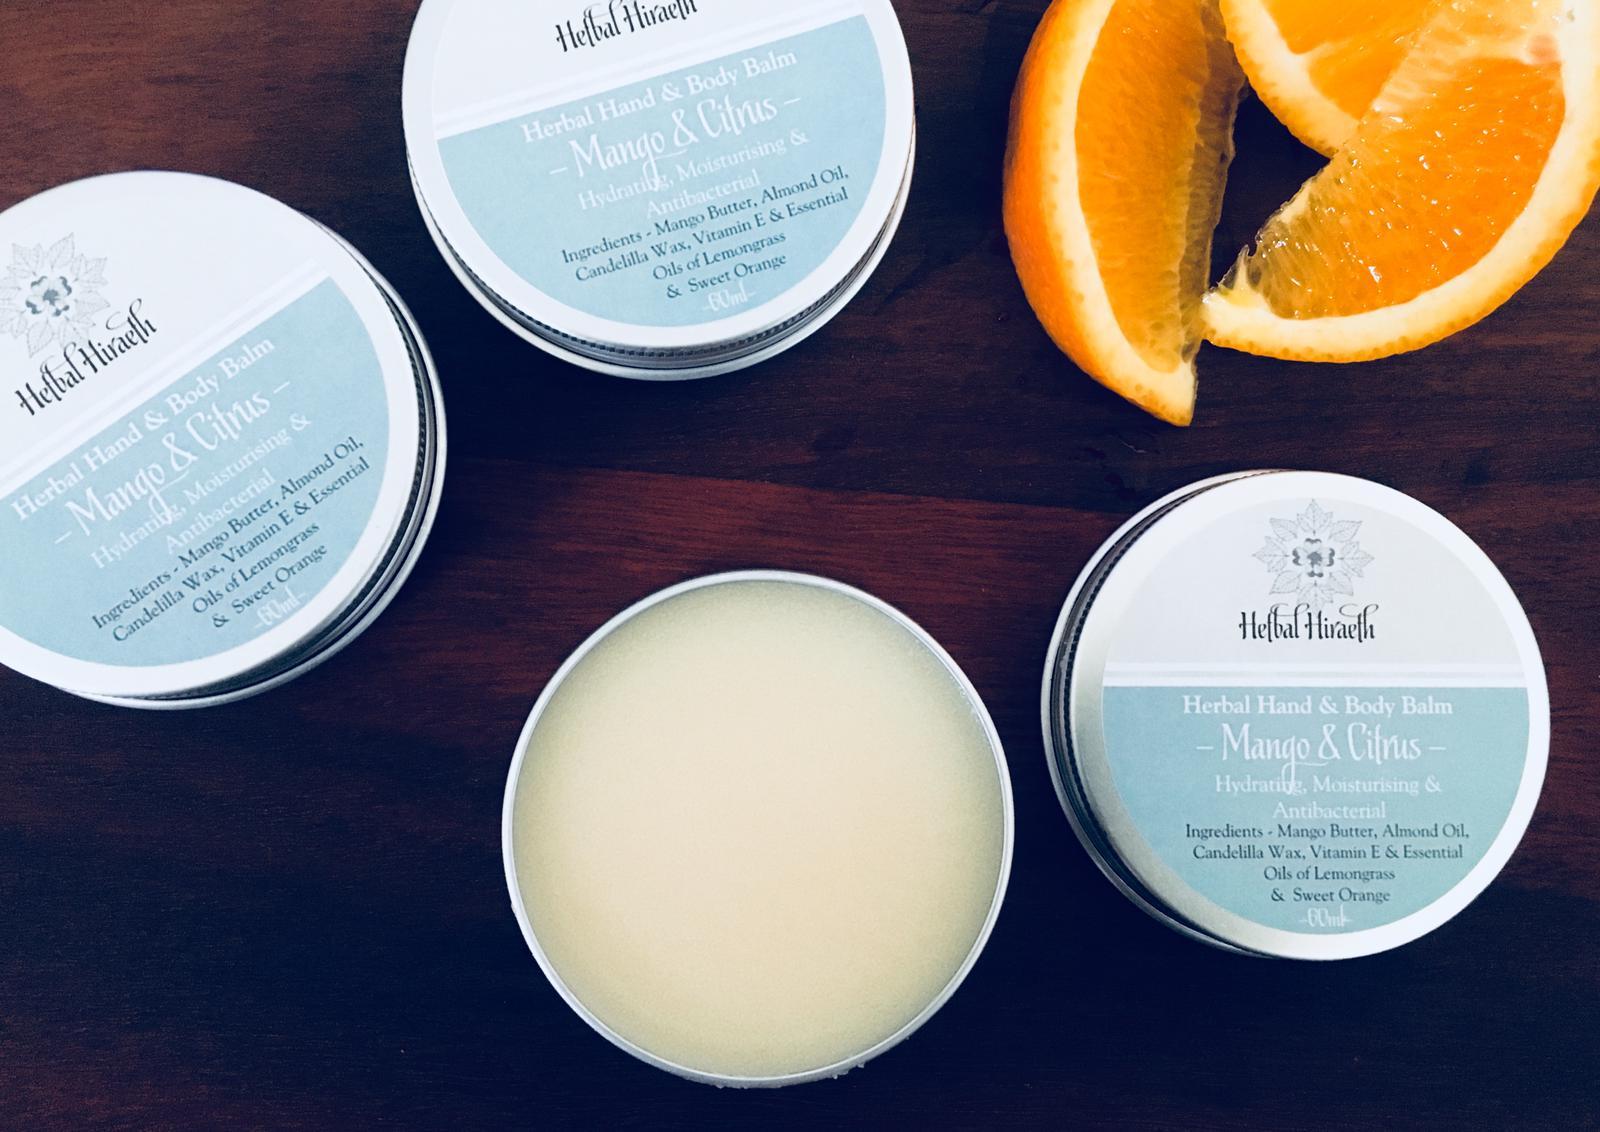 Mango & Citrus Hand & Body Balm